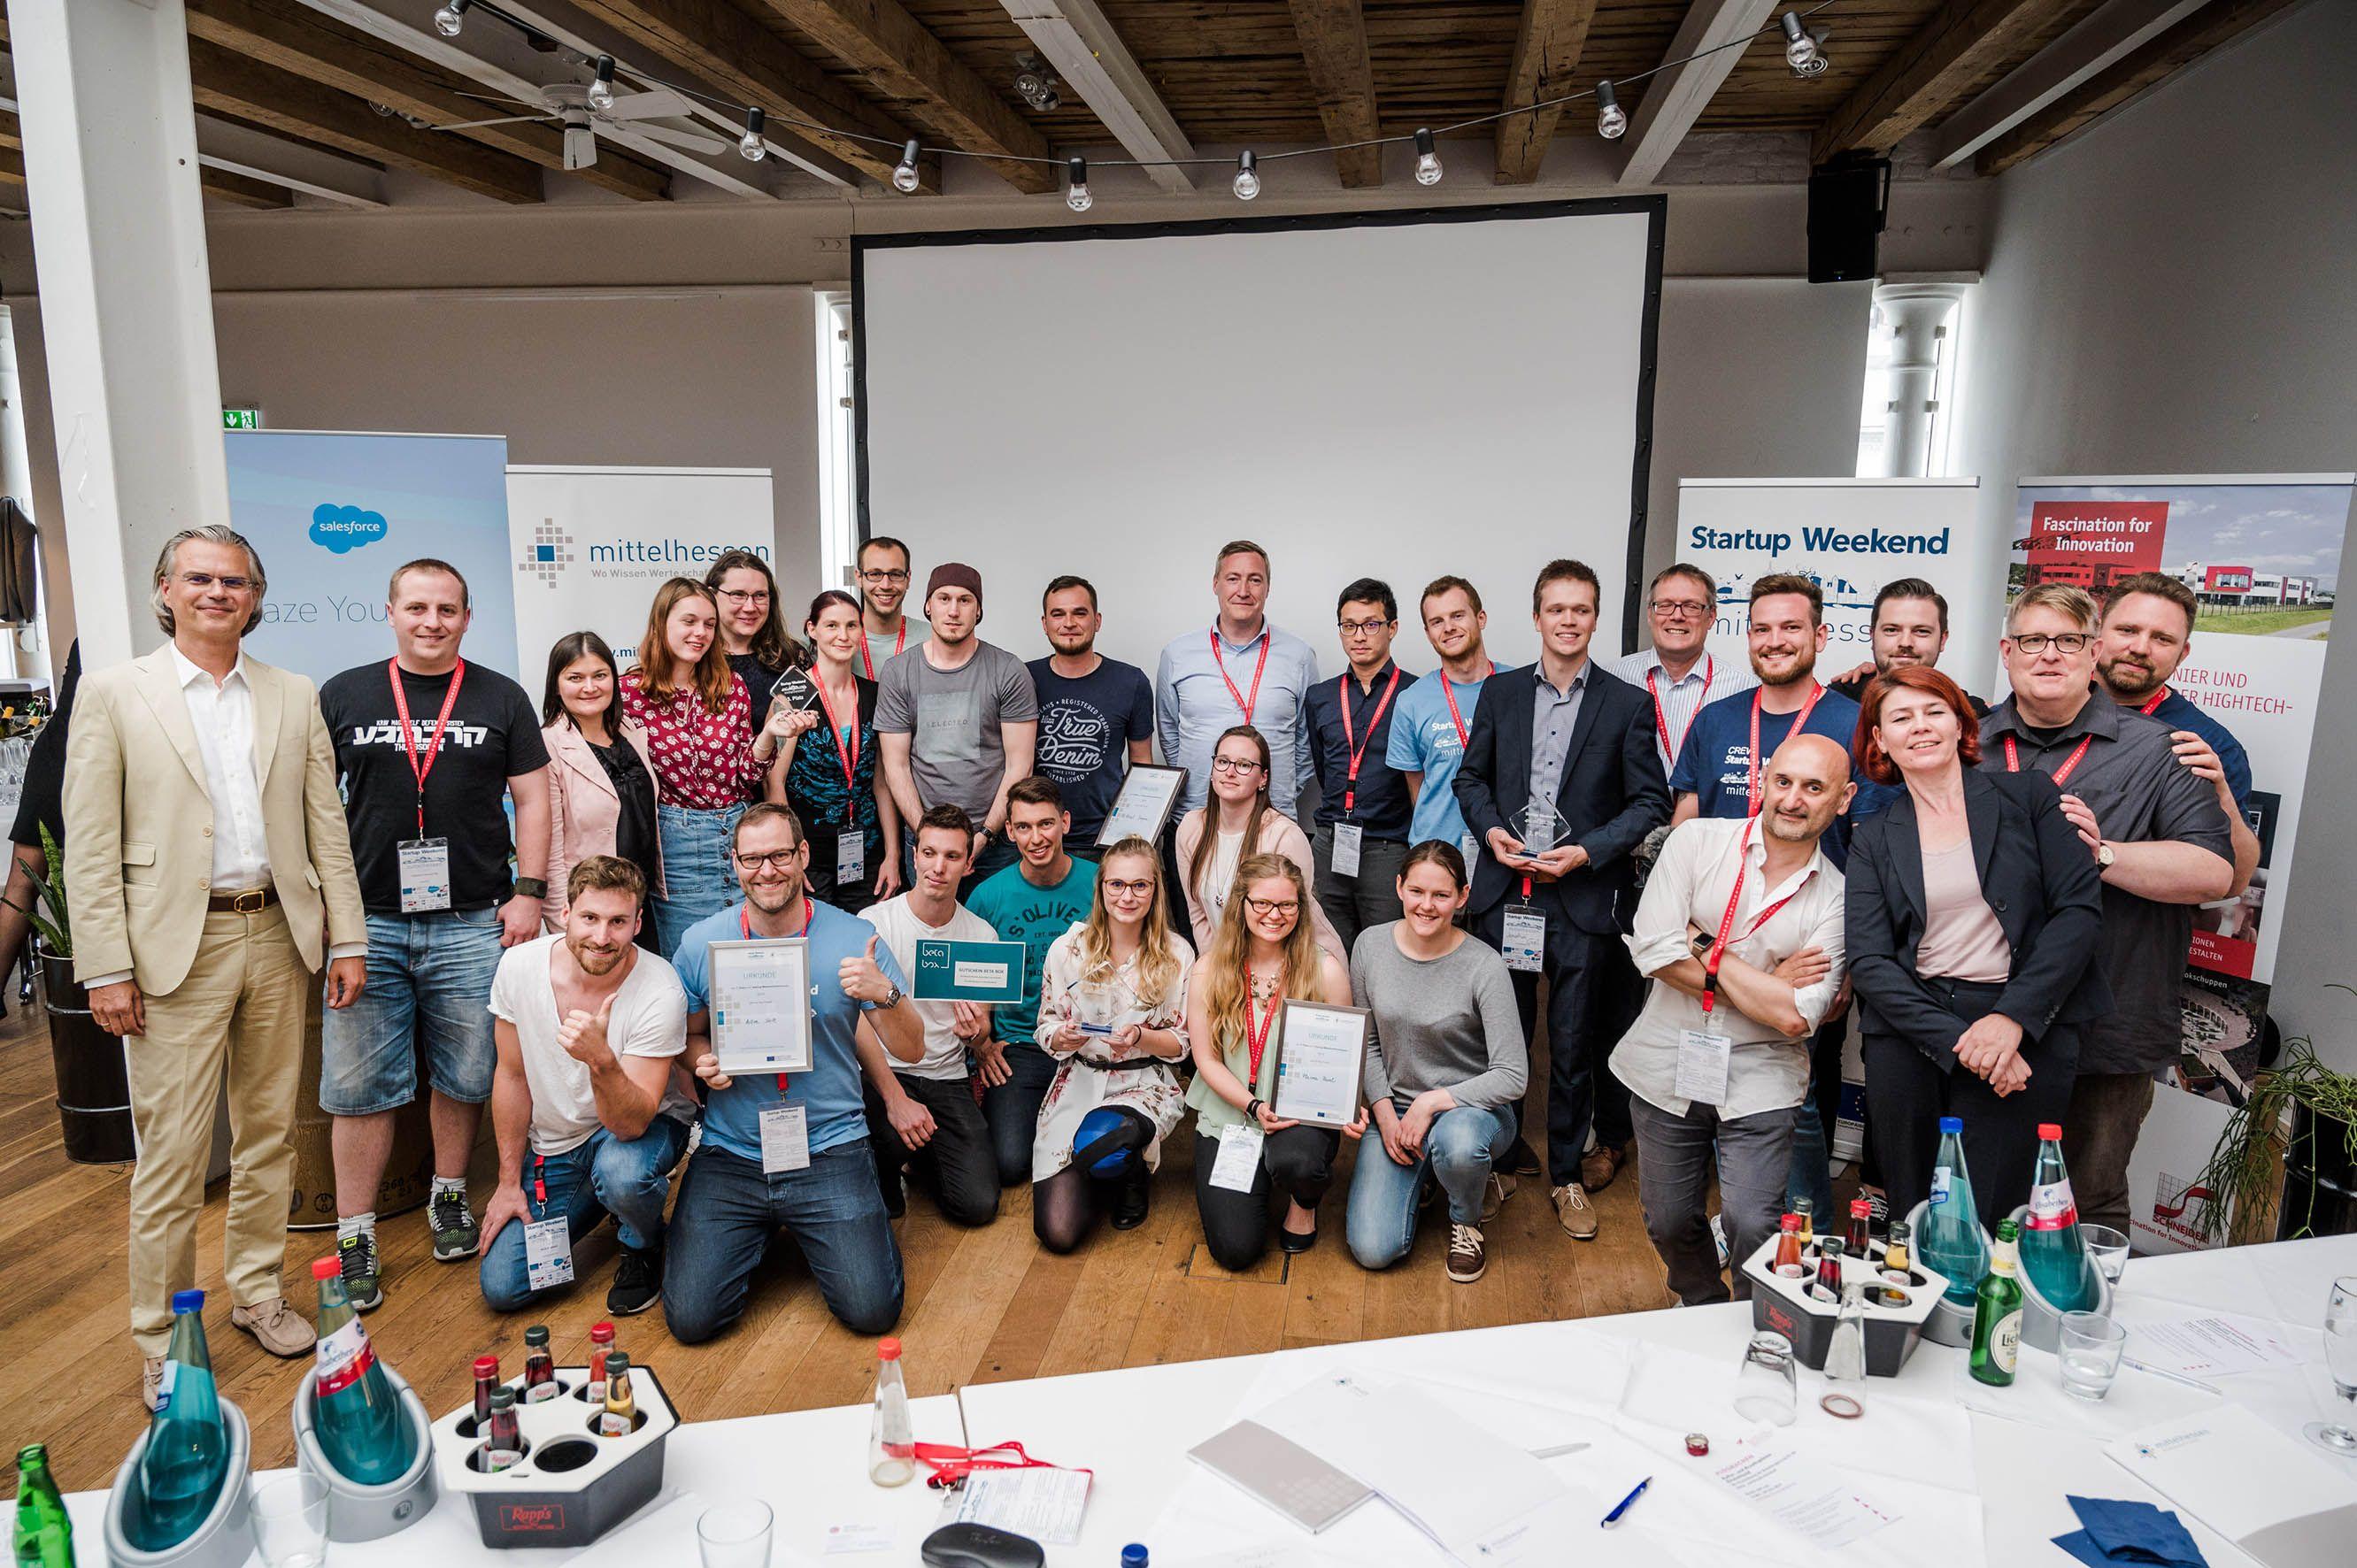 Startup Weekend Mittelhessen 2019 - Final Pitches